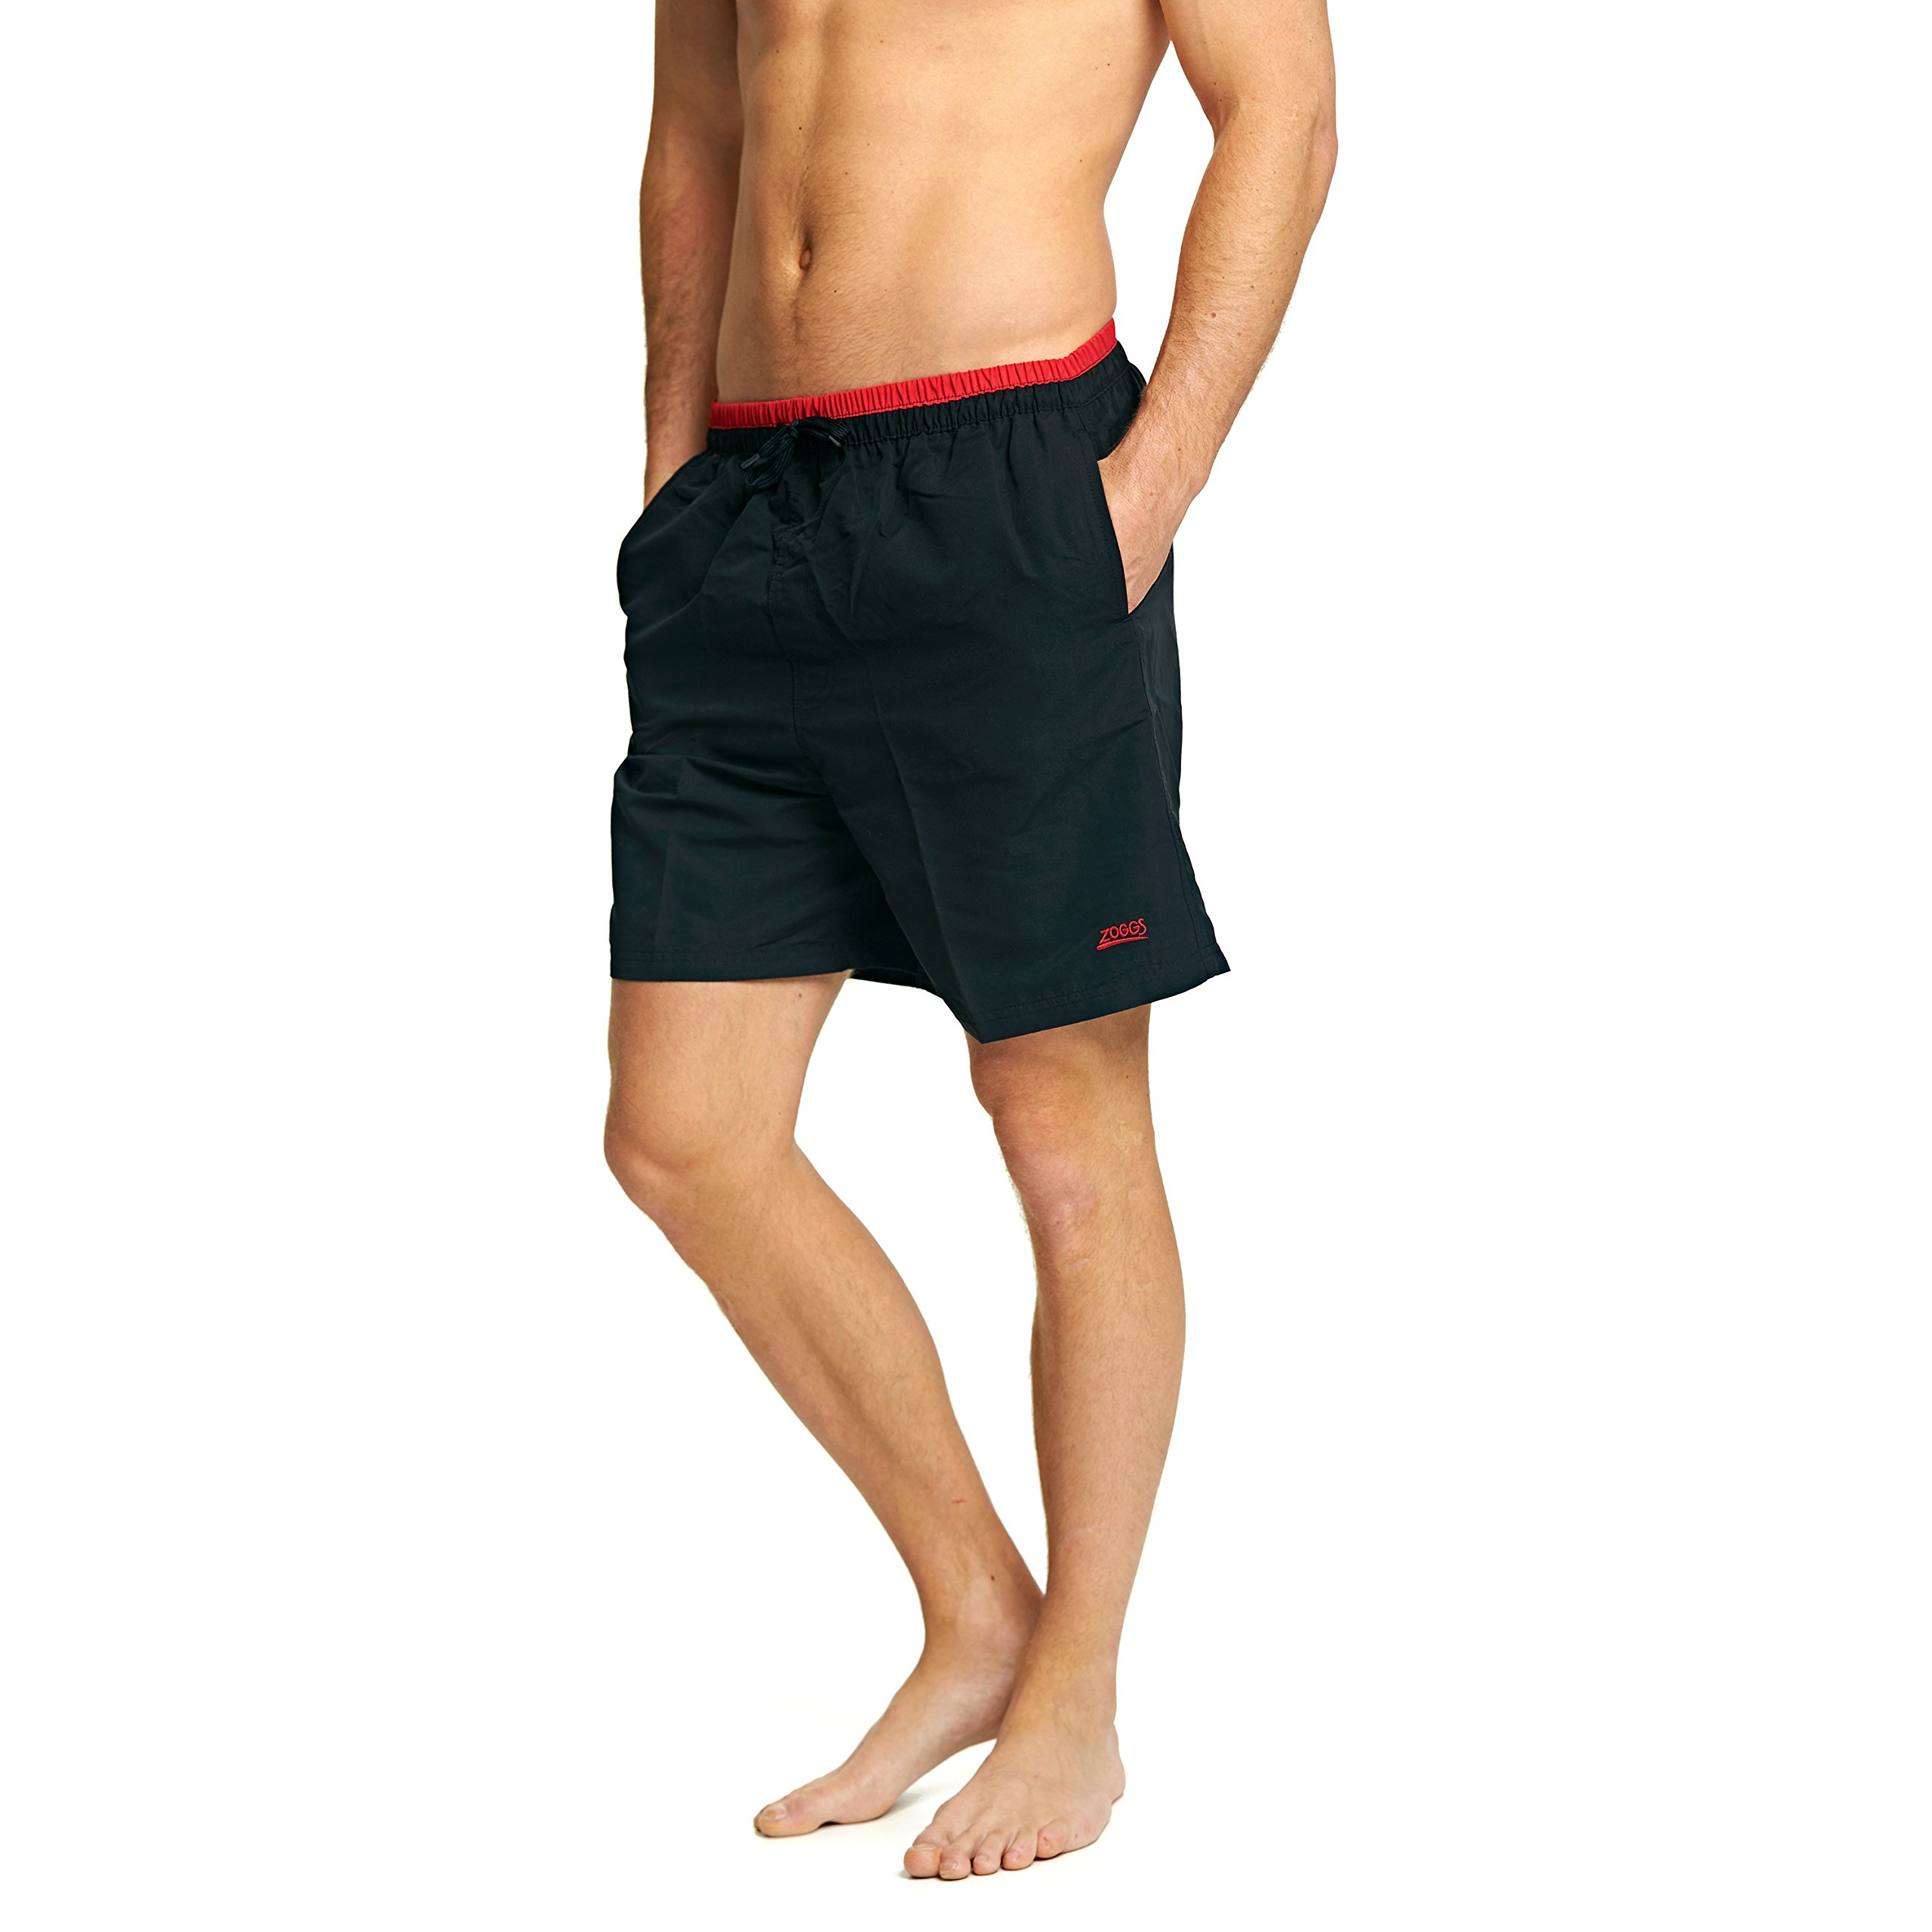 Men's Clothing Summer Brand Beach Shorts Men Swimsuit Swimwear Quick Dry Mens Board Shorts Male Bermudas Bathing Short Sportswear Inside Liner Shrink-Proof